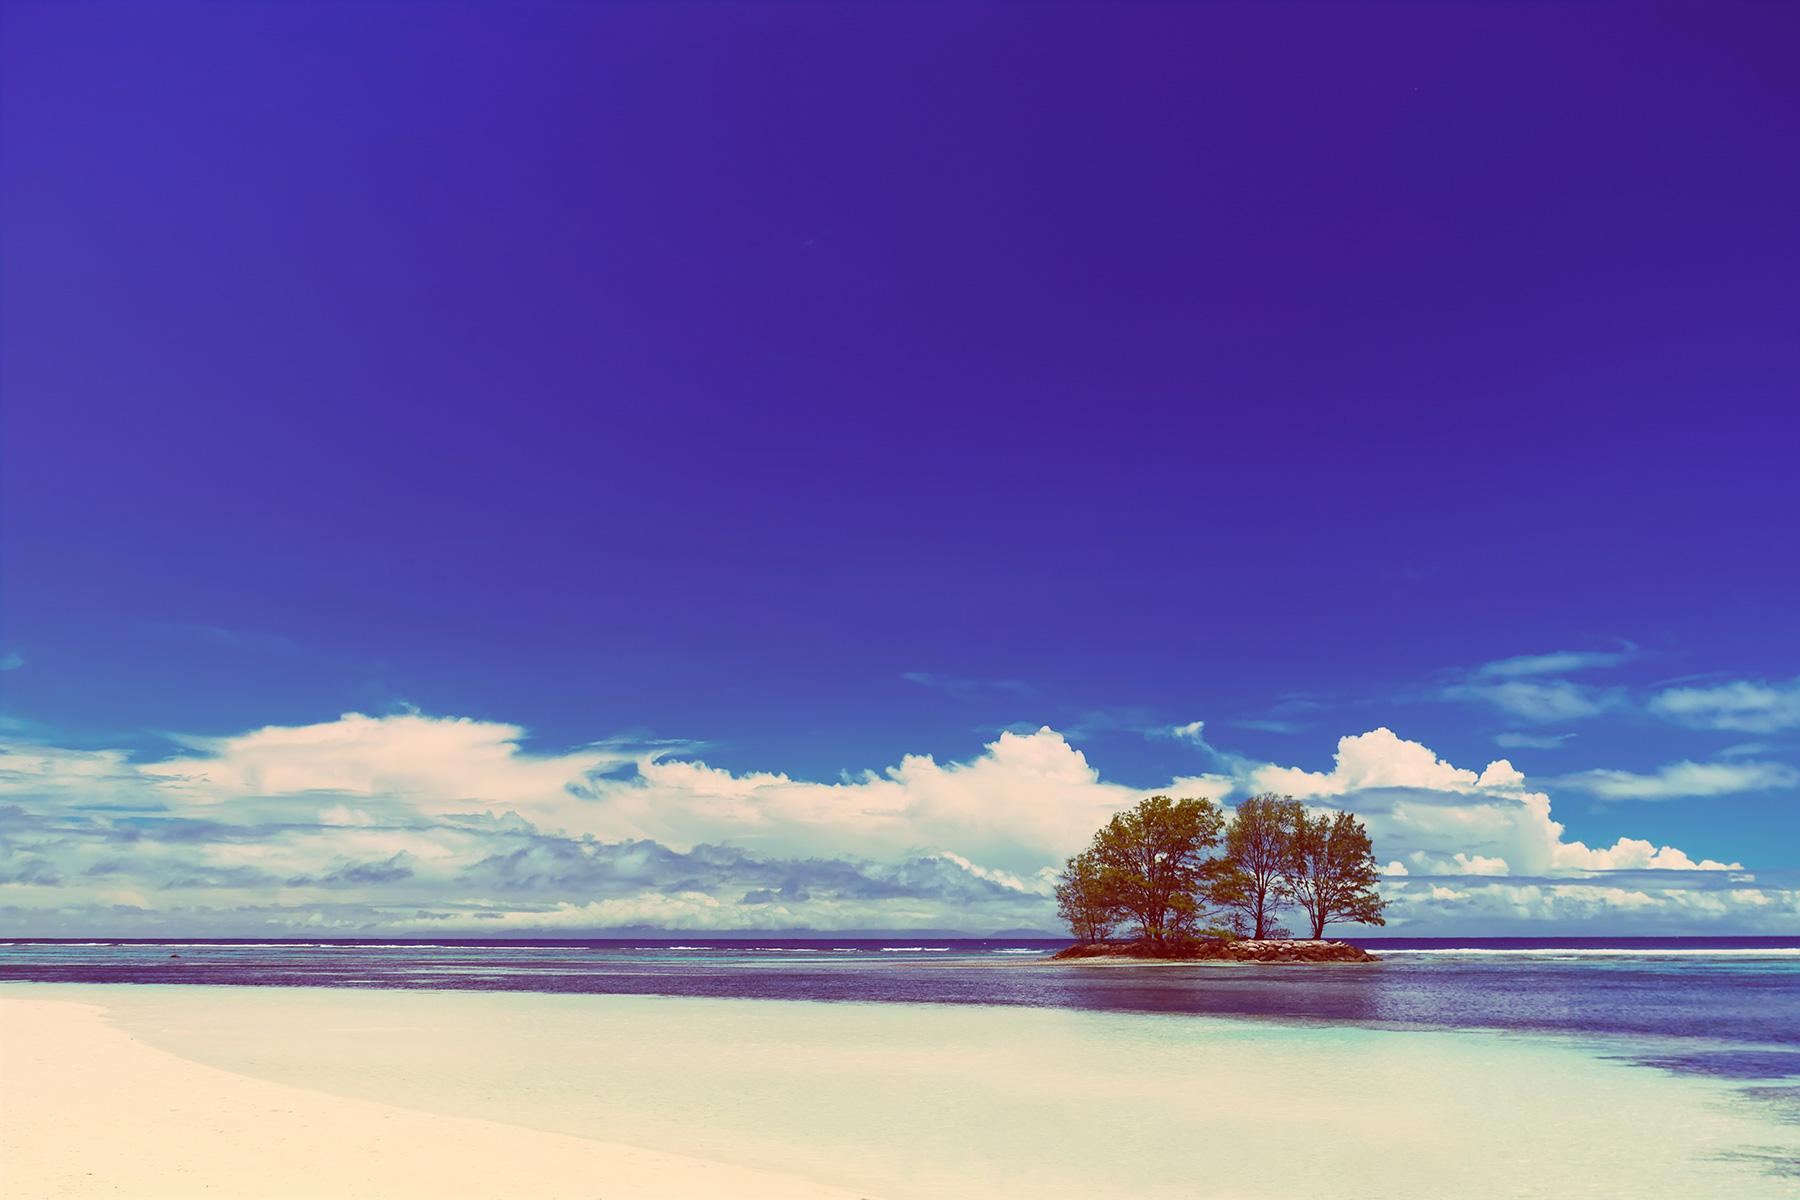 White-Coral-Beach-Sand-And-Azu